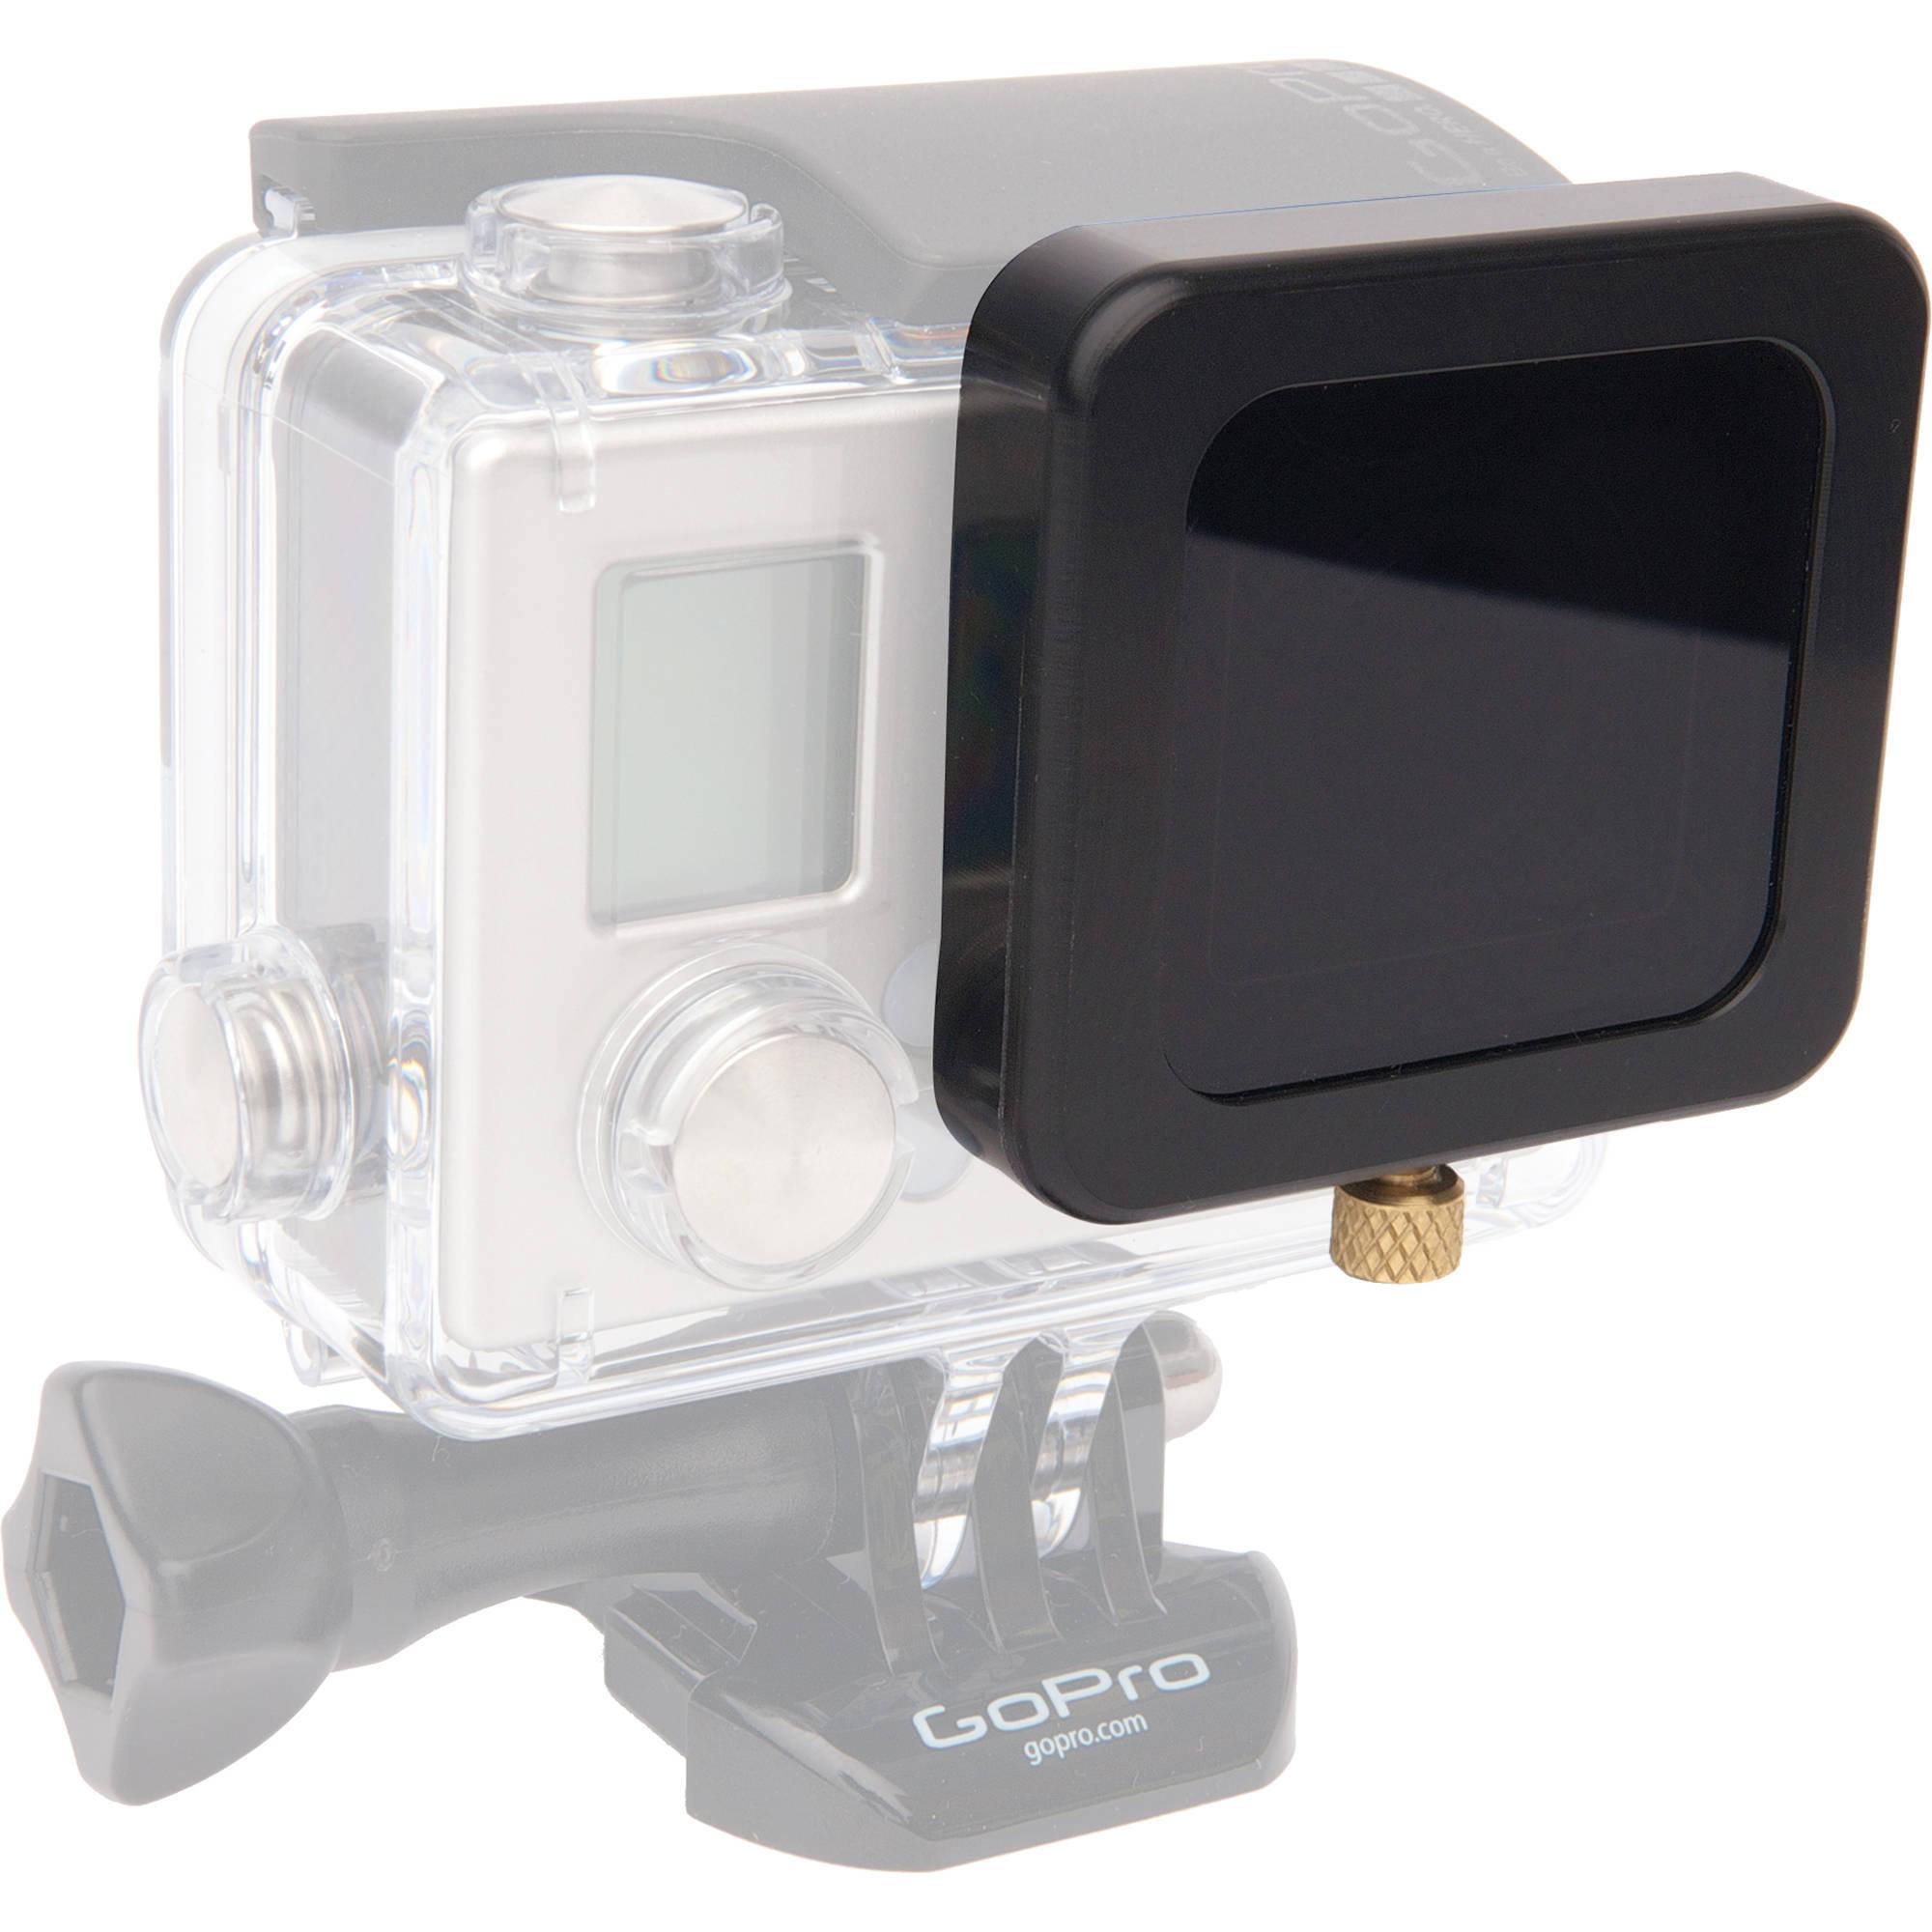 Formatt Hitech Filter Holder for GoPro Hero3+ & Hero4 HTGP5